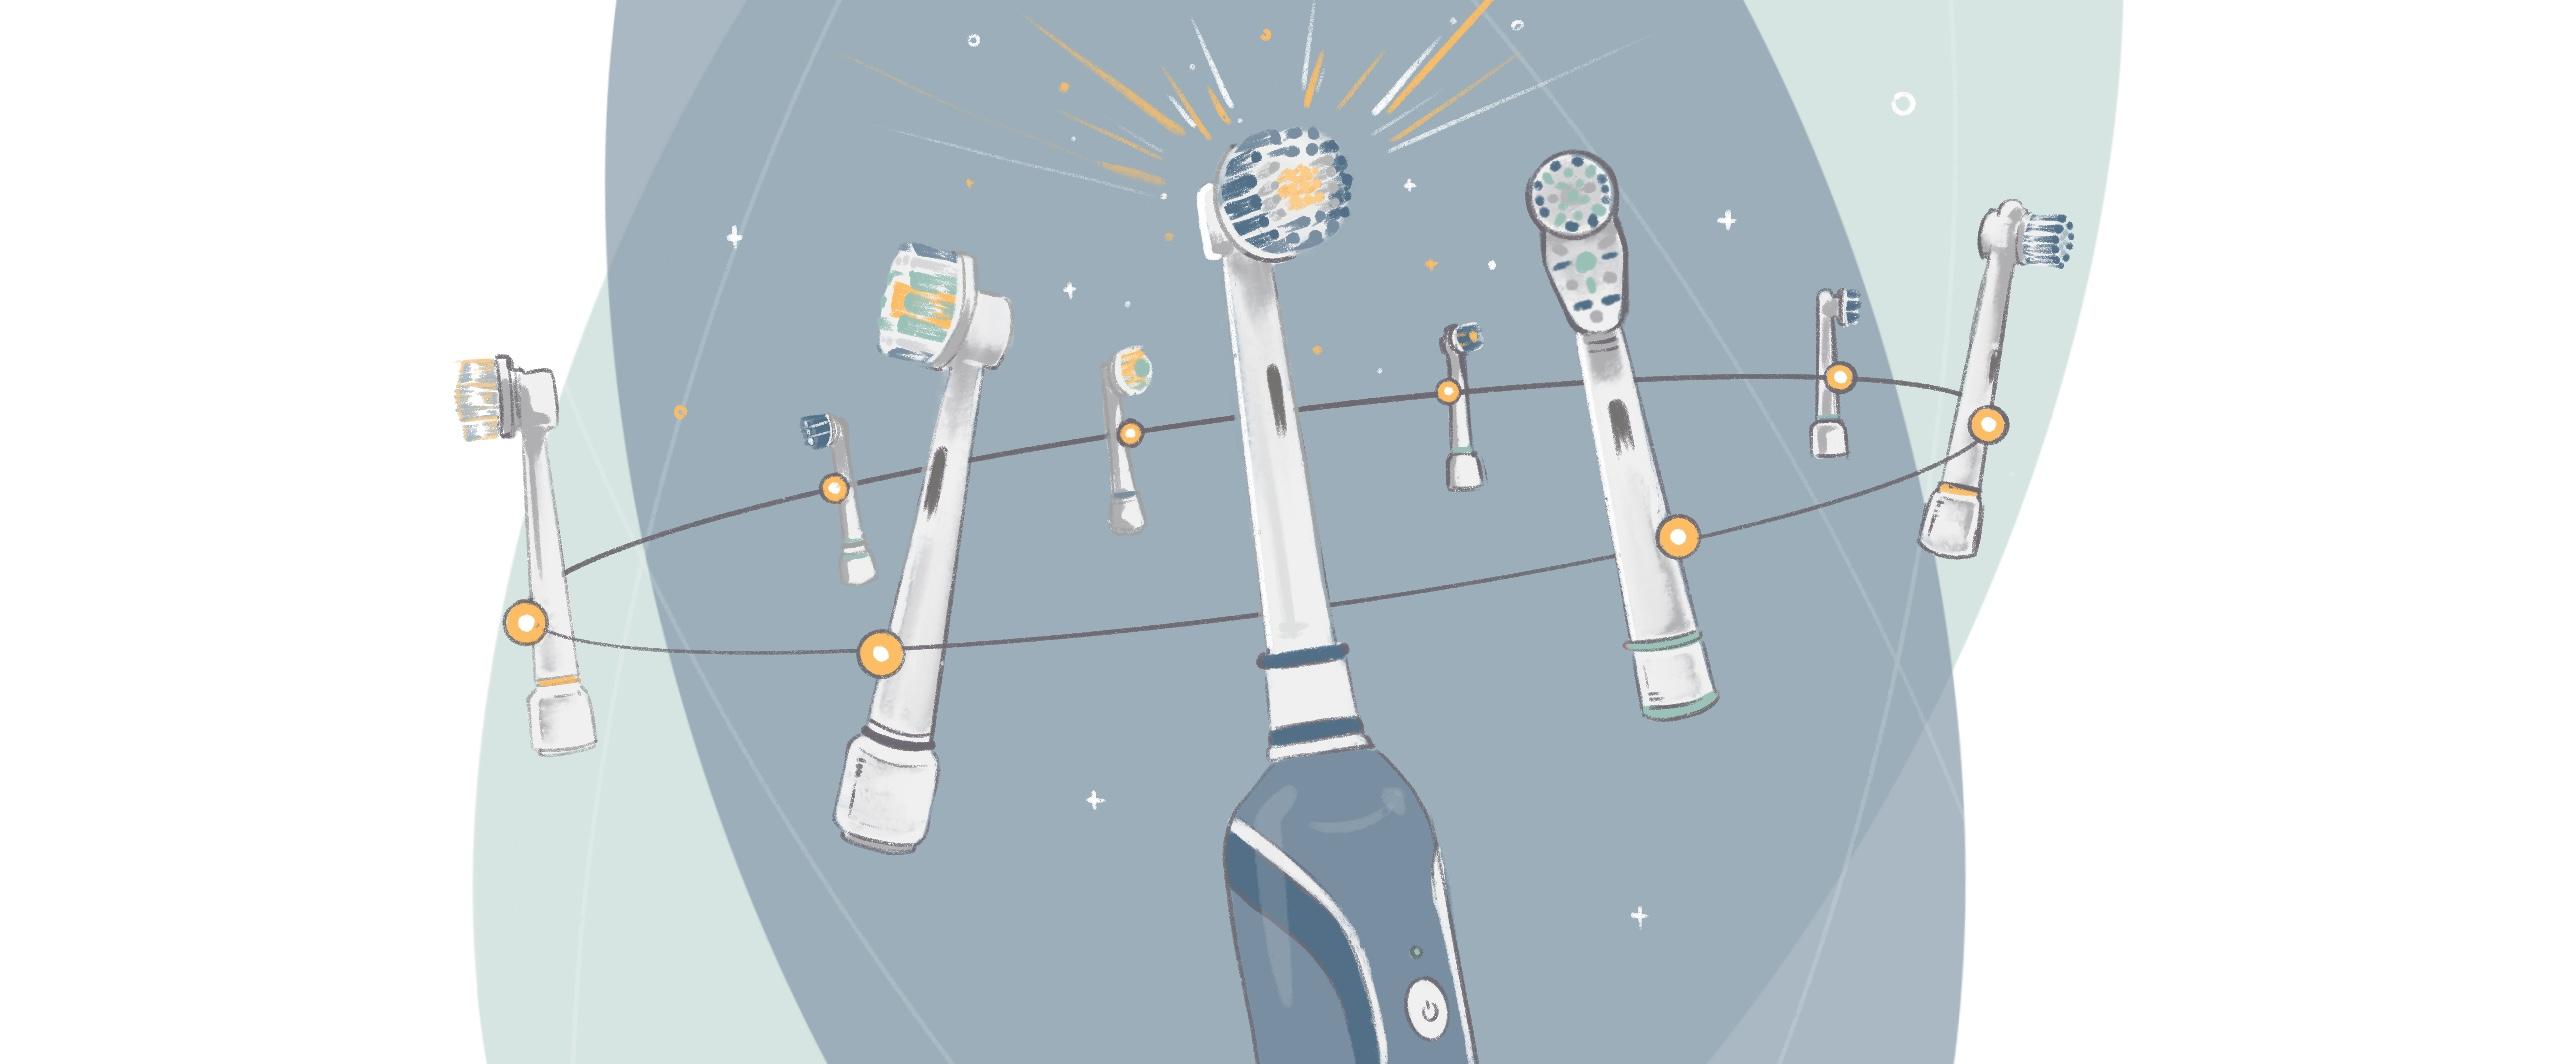 oral-b toothbrush head